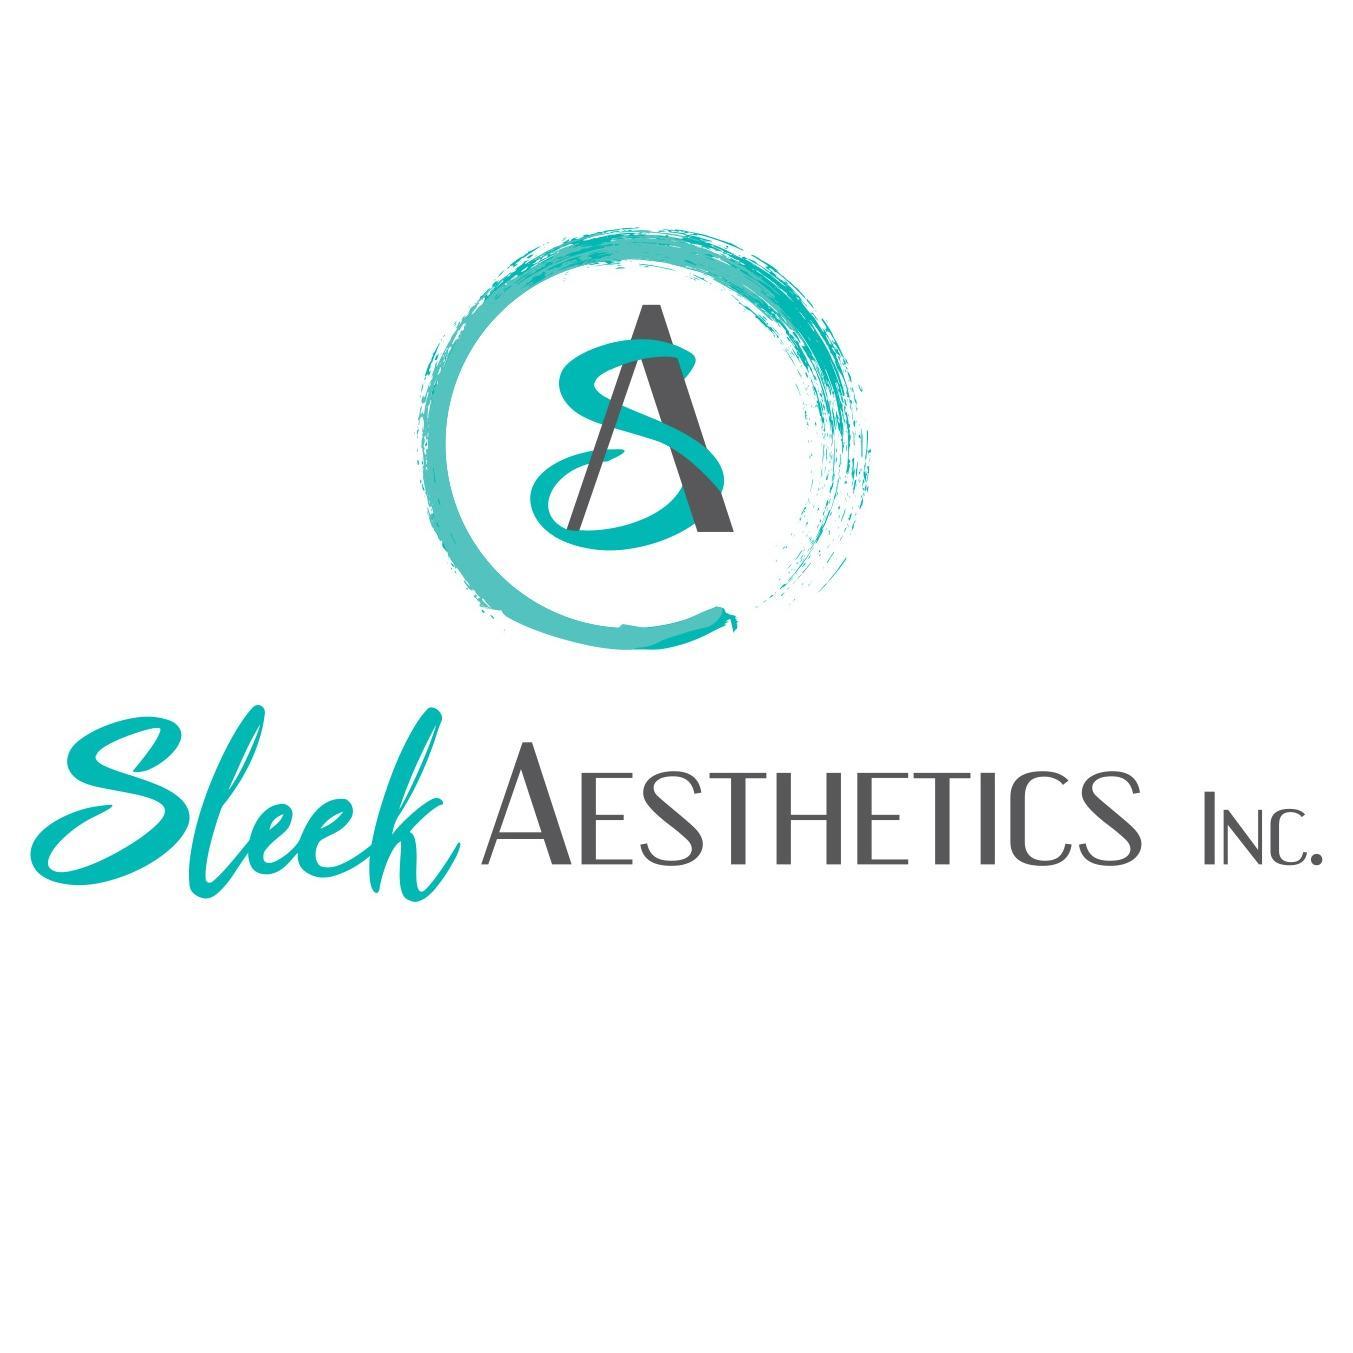 Sleek Aesthetics Inc.